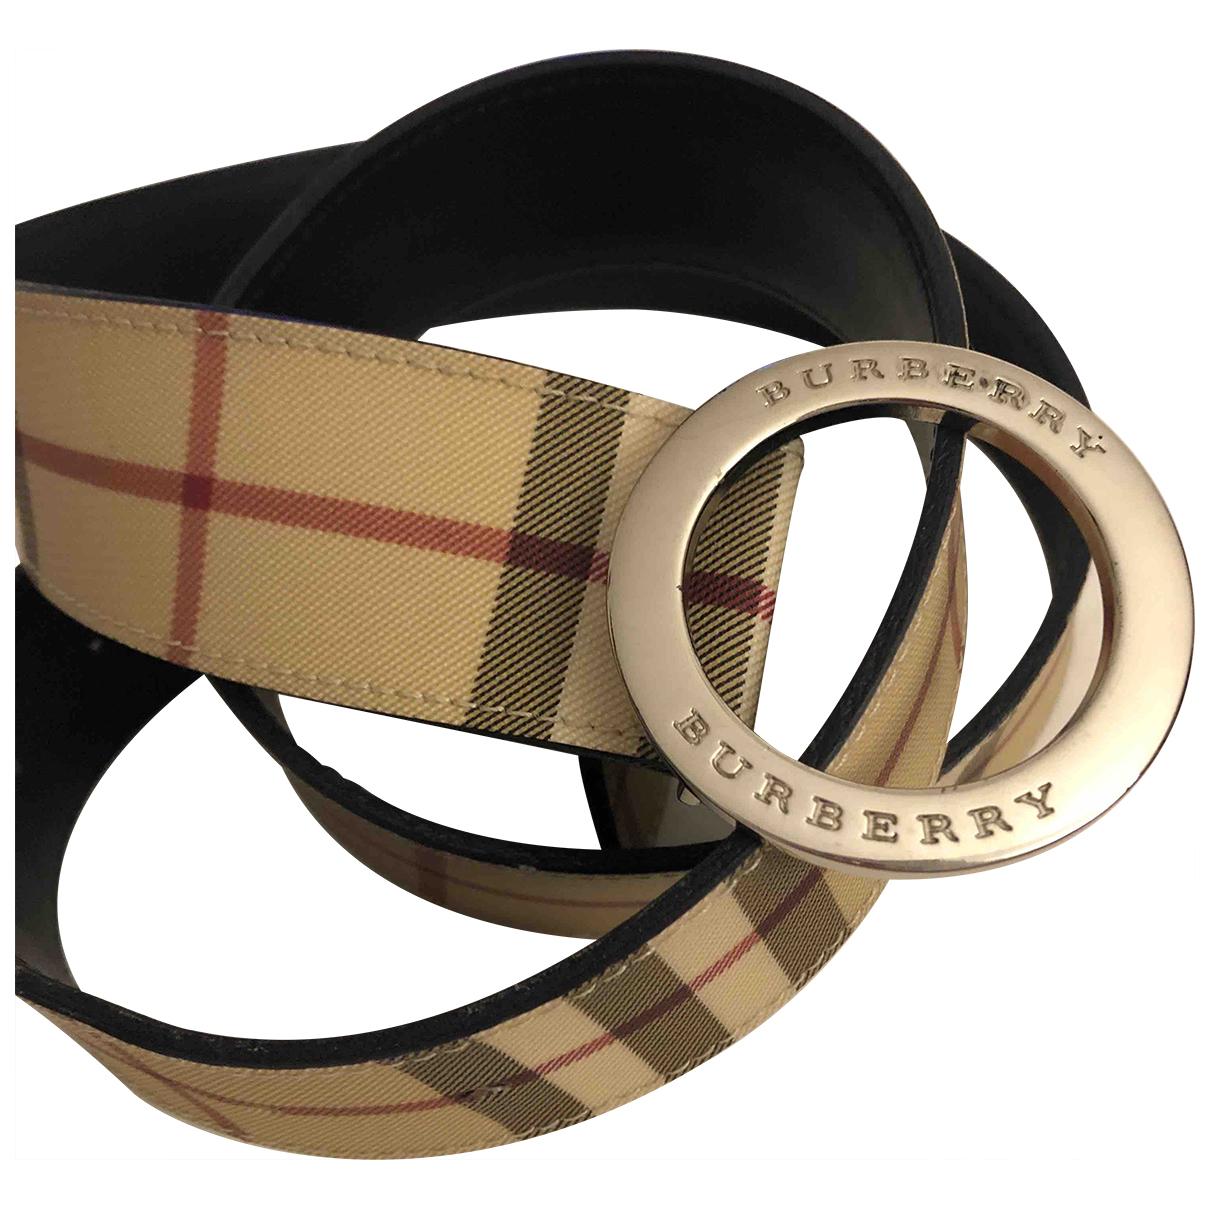 Burberry \N Beige Cloth belt for Women M International